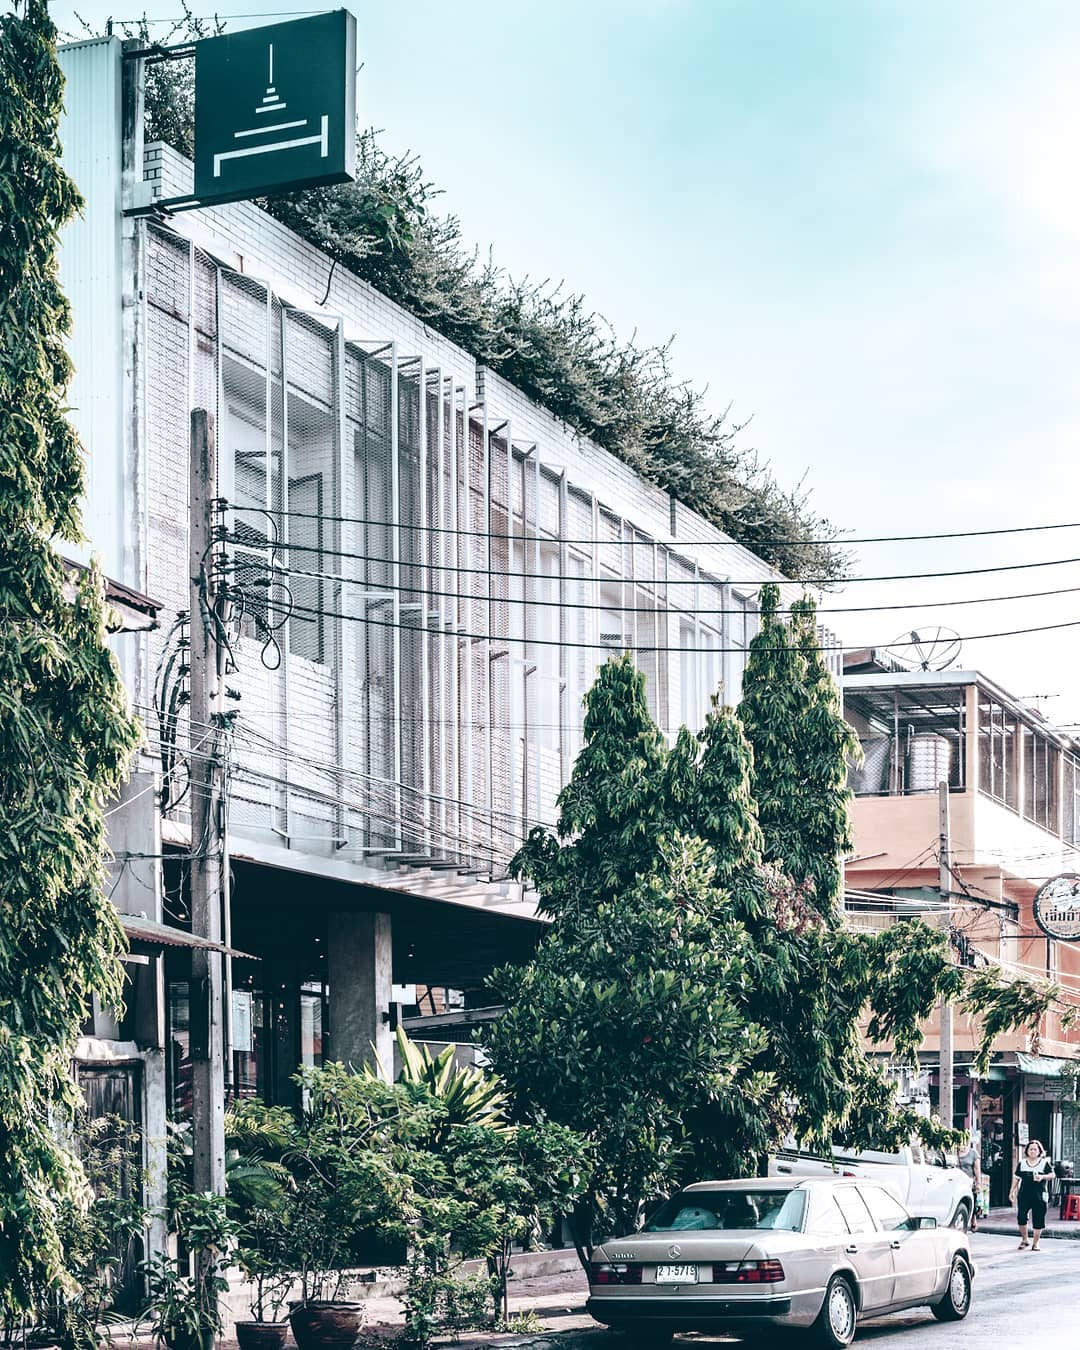 thailan_hostel-o-bangkok-01